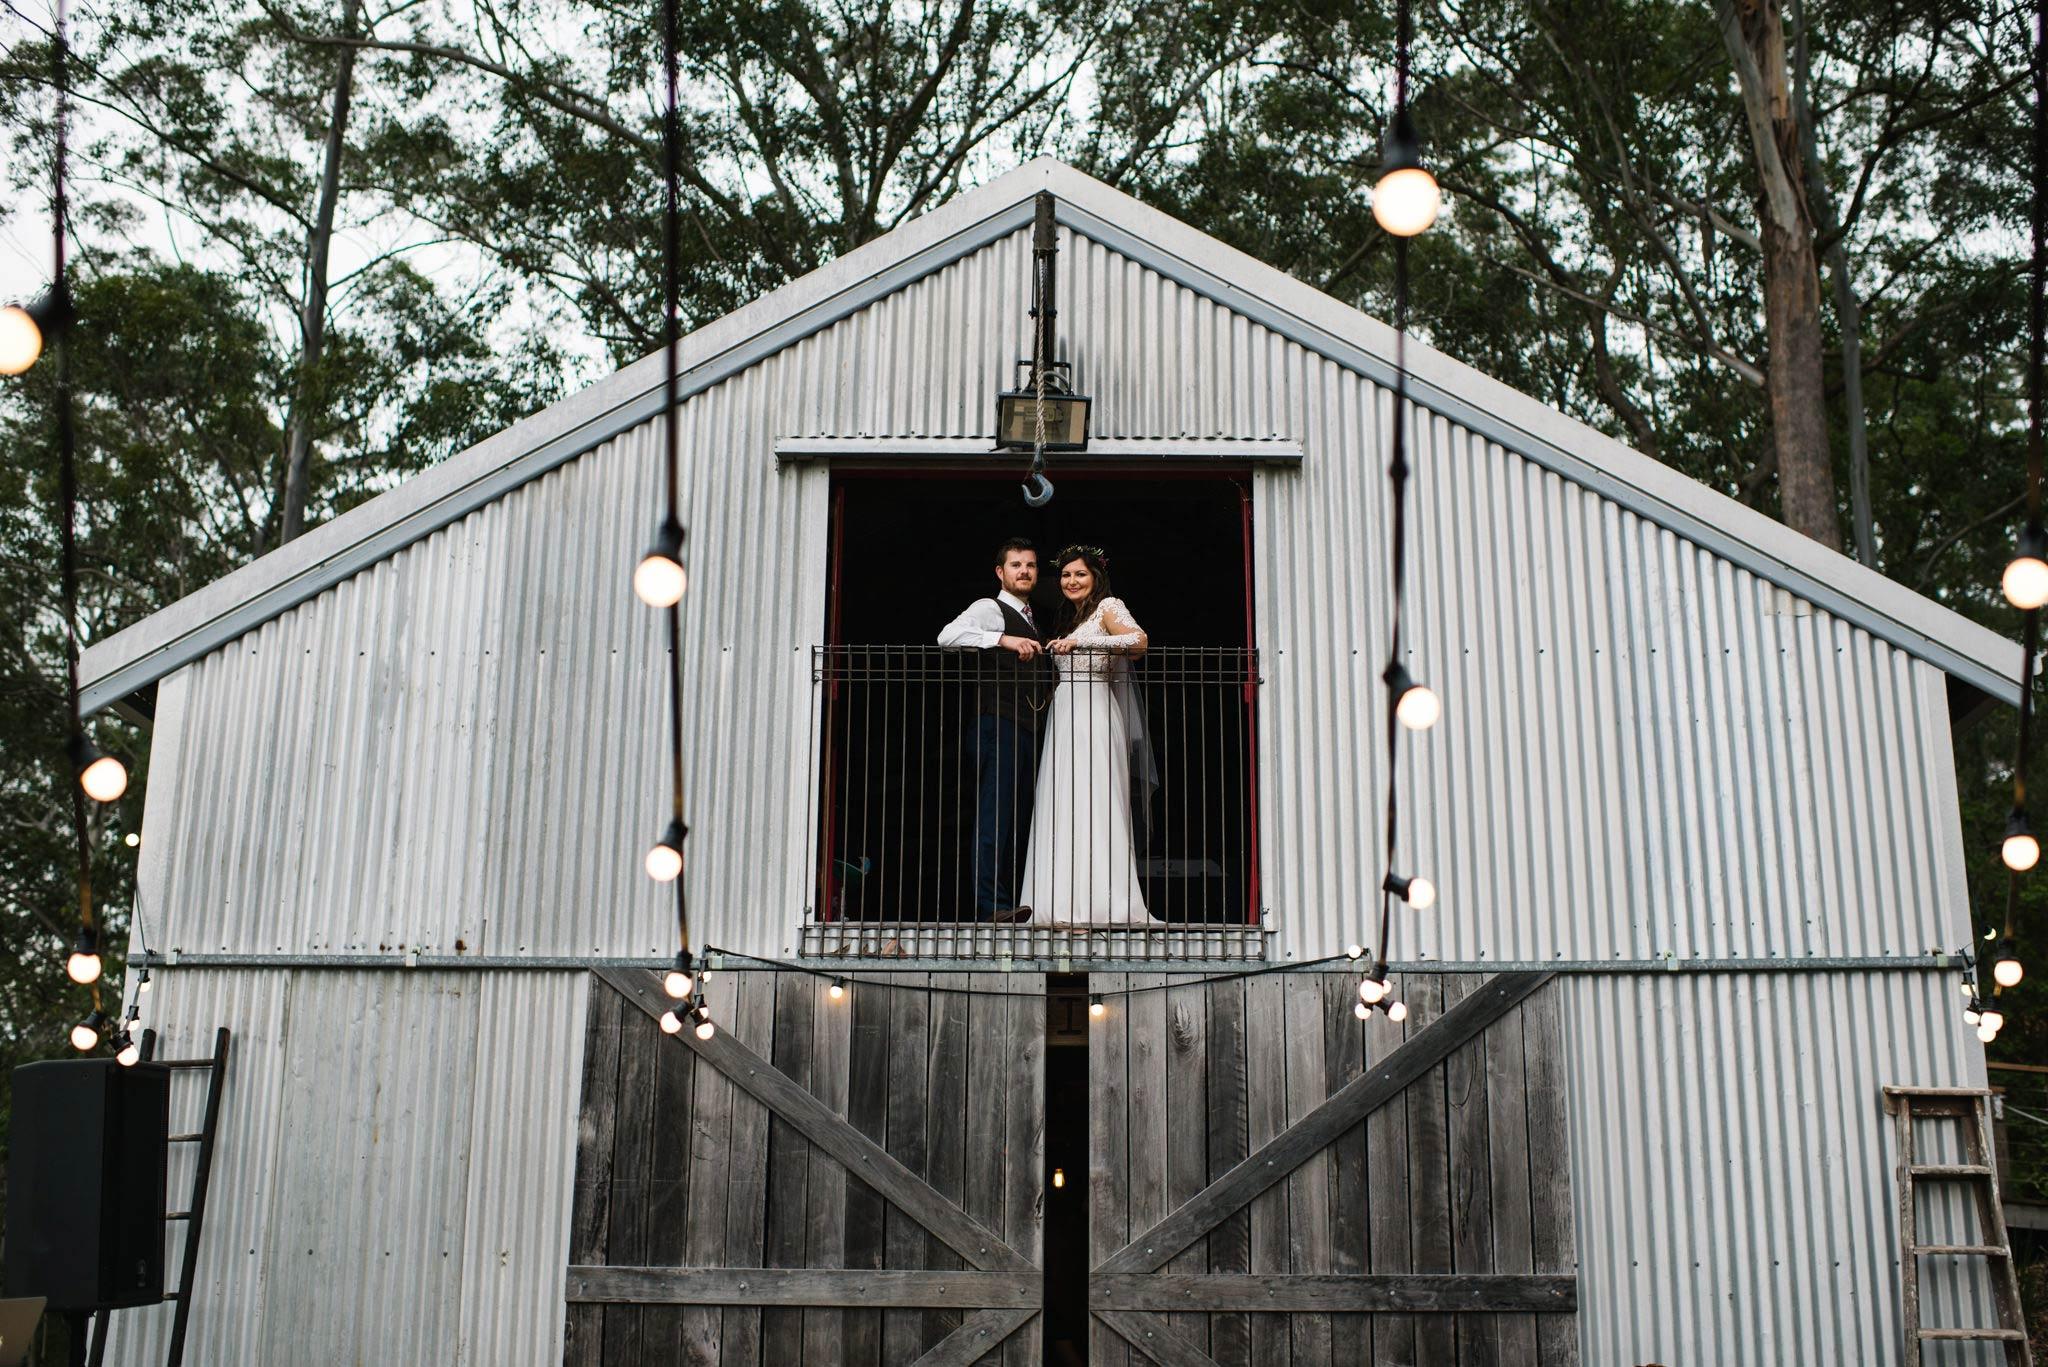 Bride and groom in window of steel barn